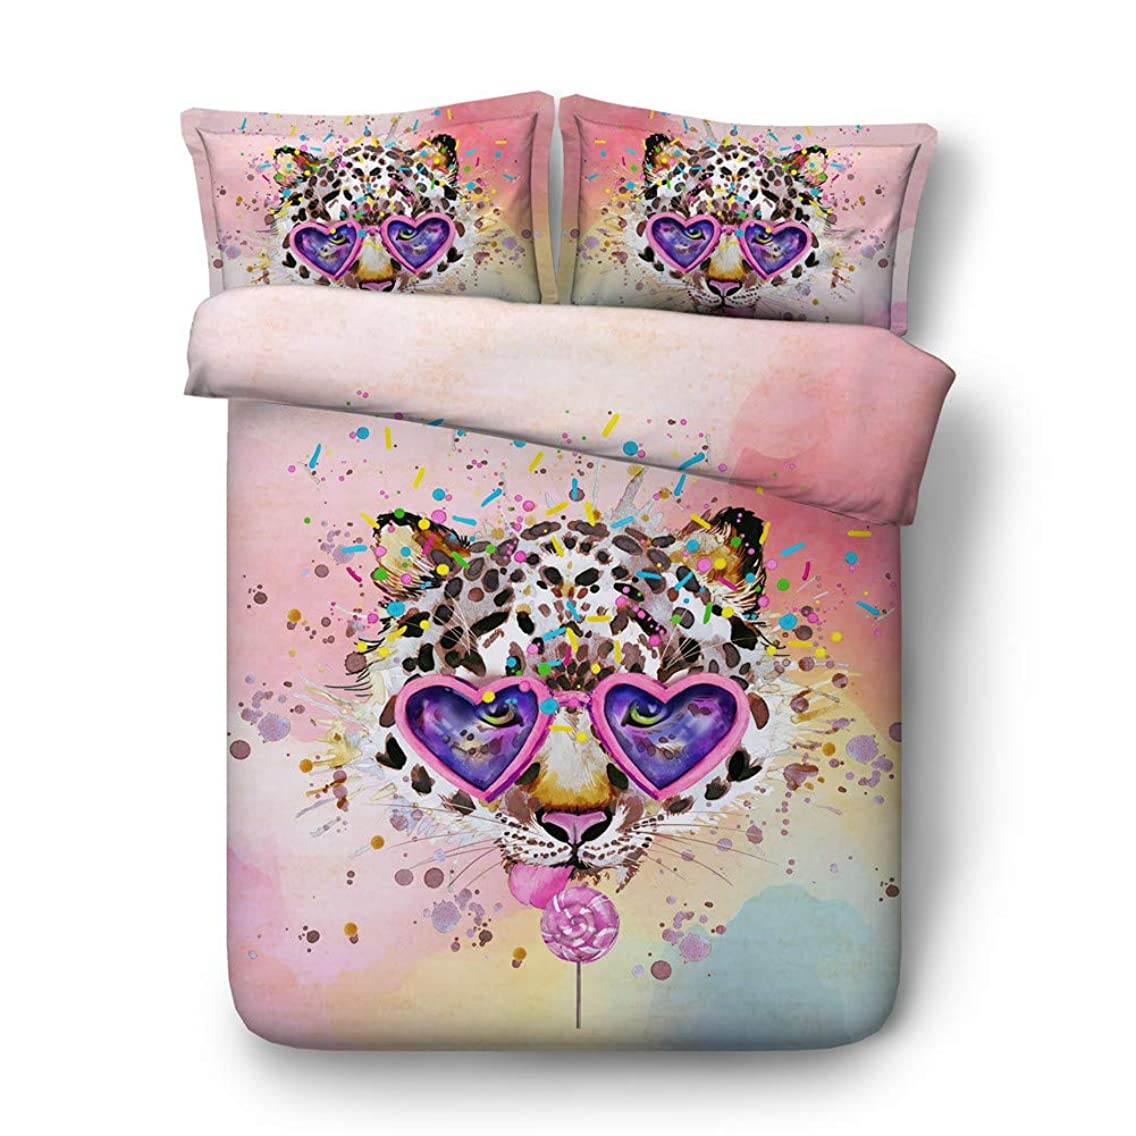 RoyalLinens Pink/Blue Watercolor Style Leopard Head Sunglasses Printed Bedding Cover Sets 3pcs 1 Duvet Cover 2 Shams (JF521, Queen 3pcs)